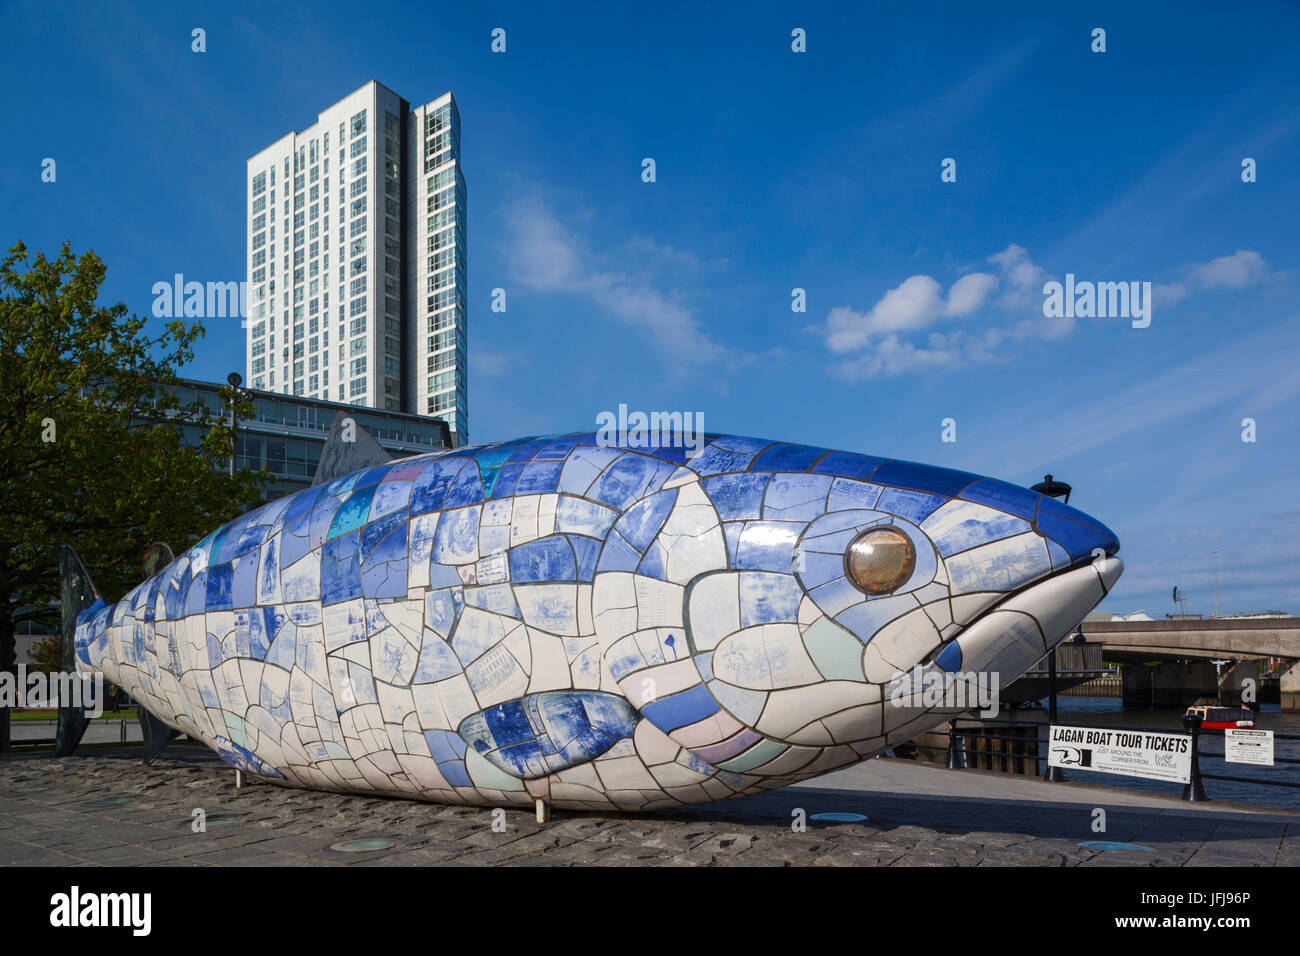 Reino Unido, Irlanda del Norte, Belfast, Bigfish escultura por John amabilidad, riverfront Foto de stock